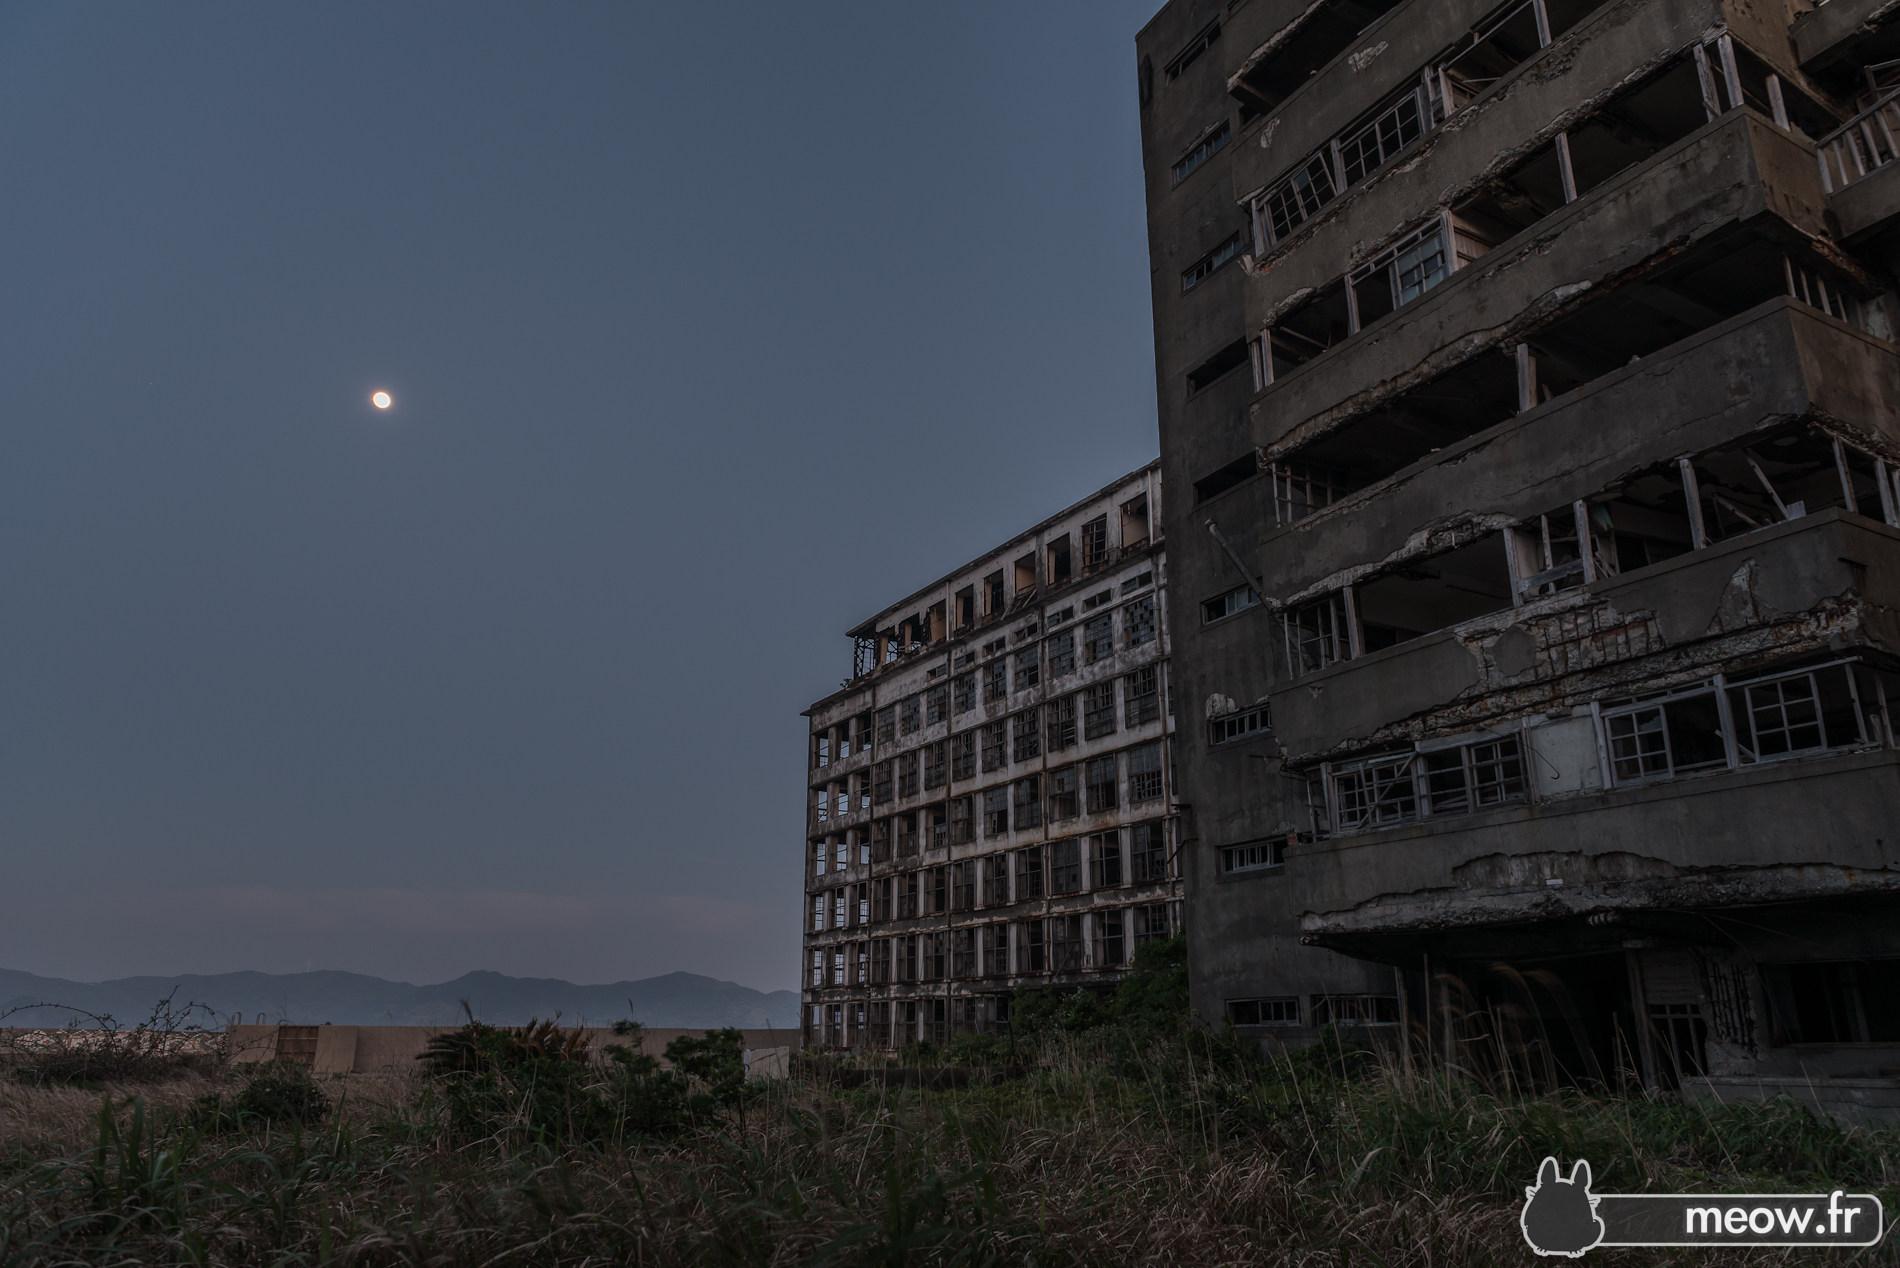 Gunkanjima Moon